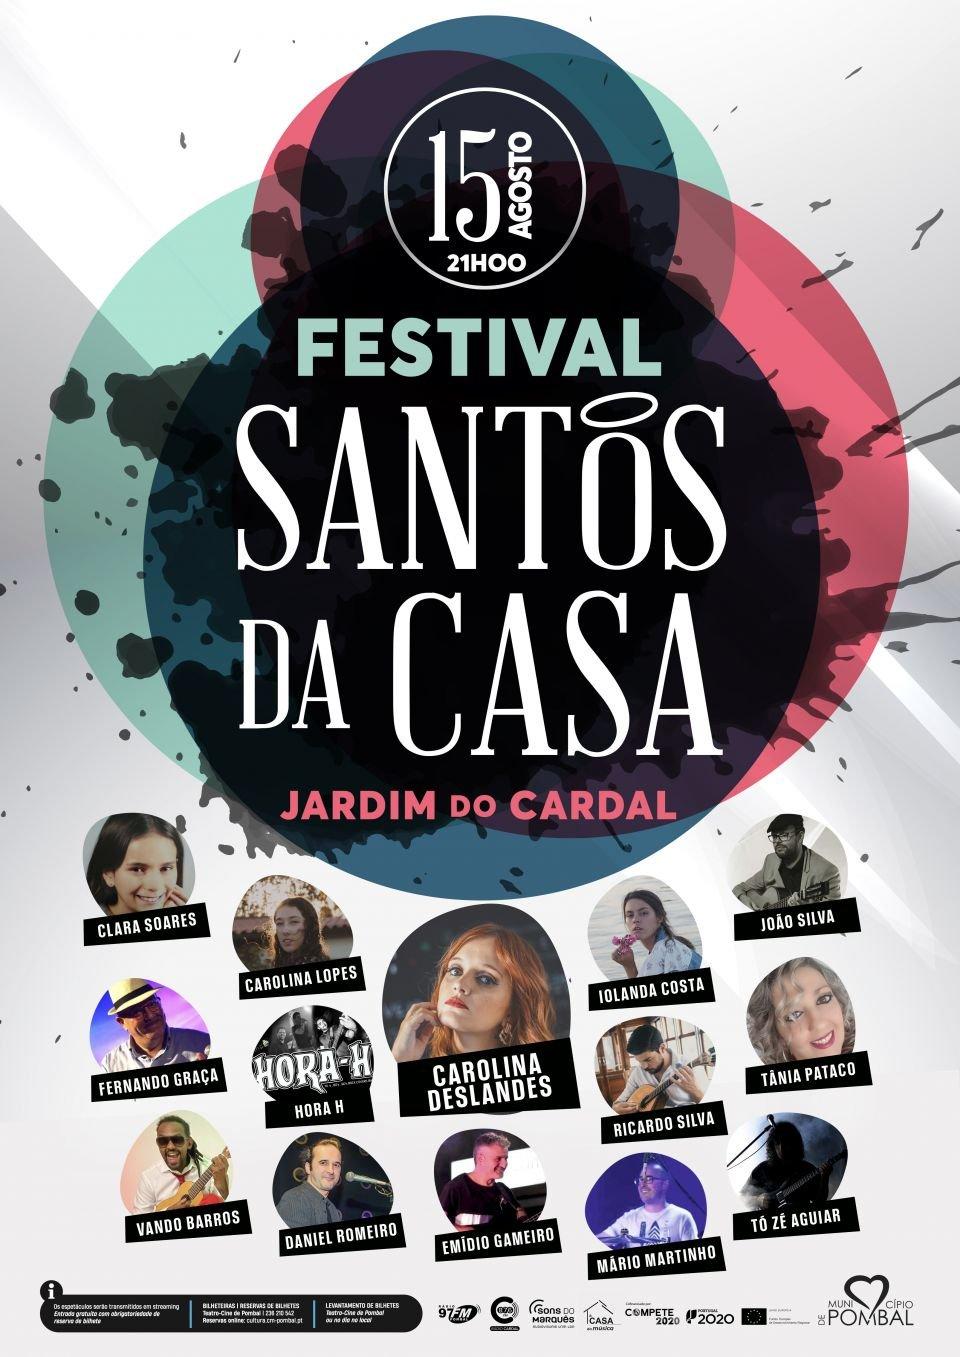 Festival Santos da Casa